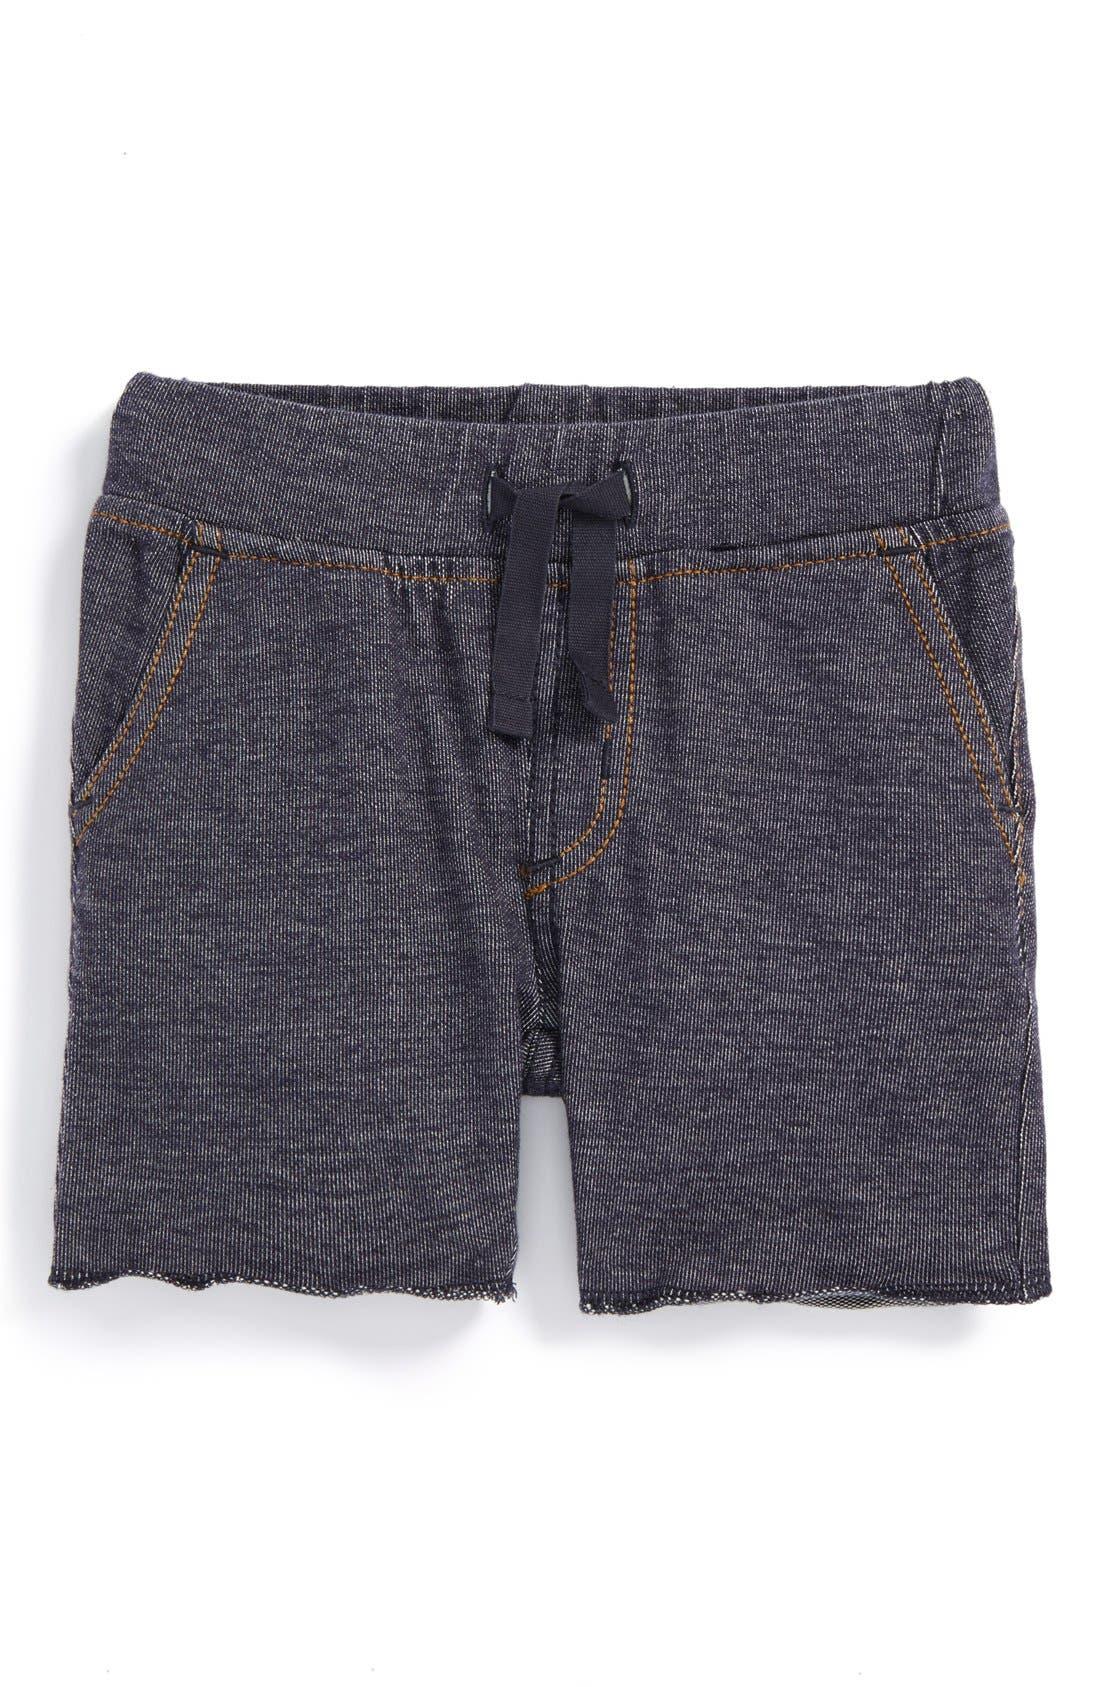 Denim Look Shorts,                             Main thumbnail 1, color,                             Indigo